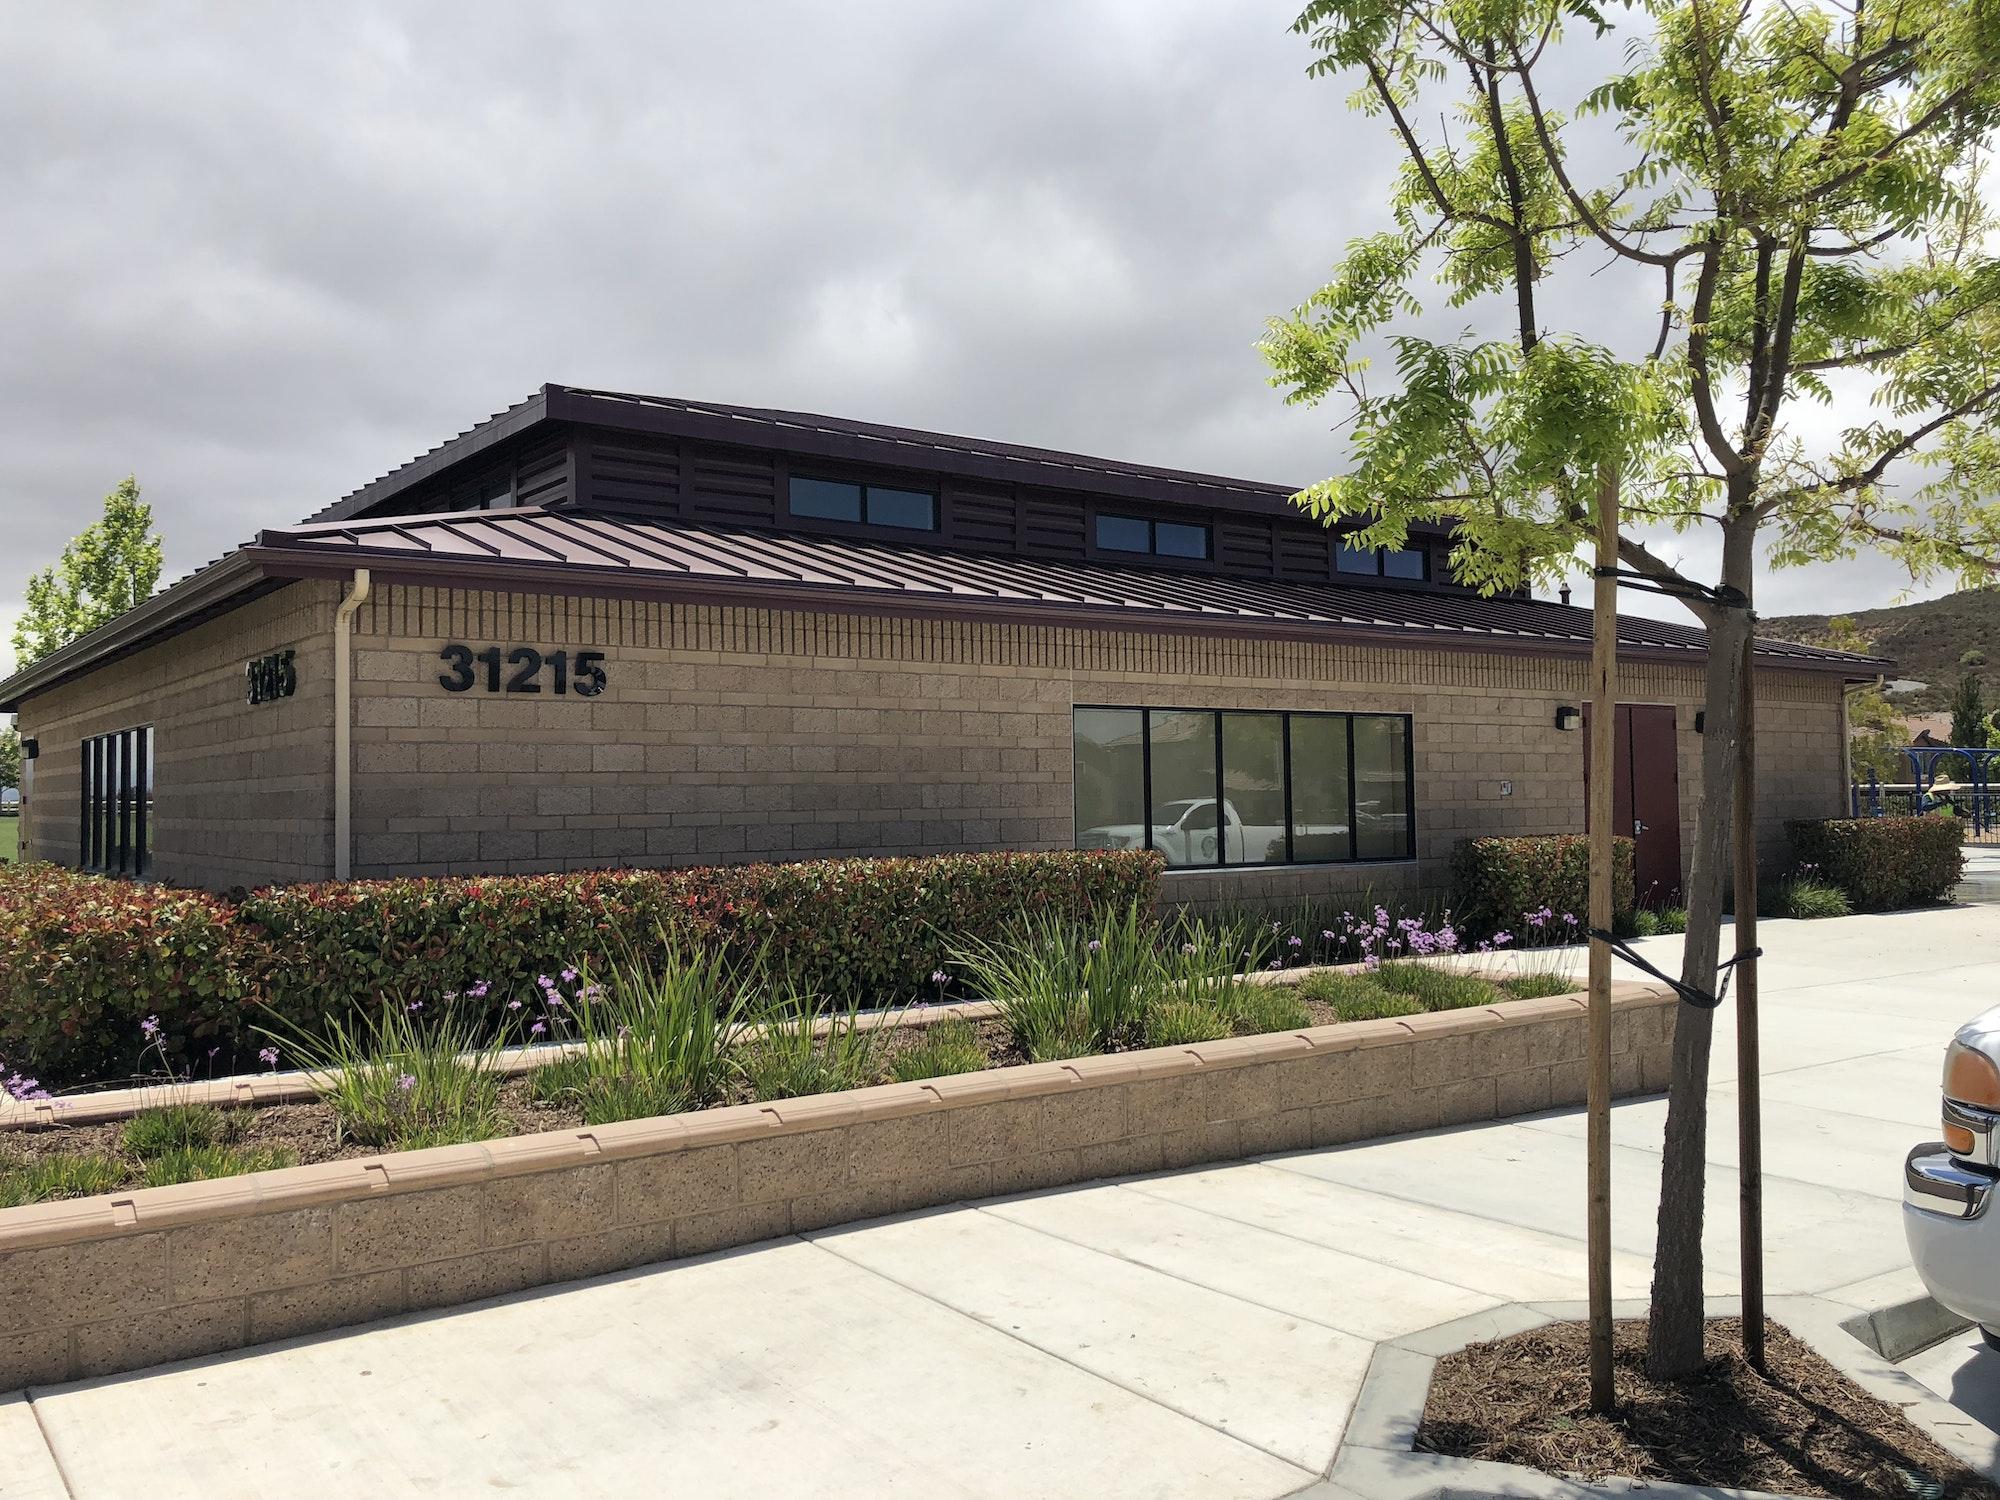 Rancho Bella Vista 2 Community Center and Park - Valley-Wide